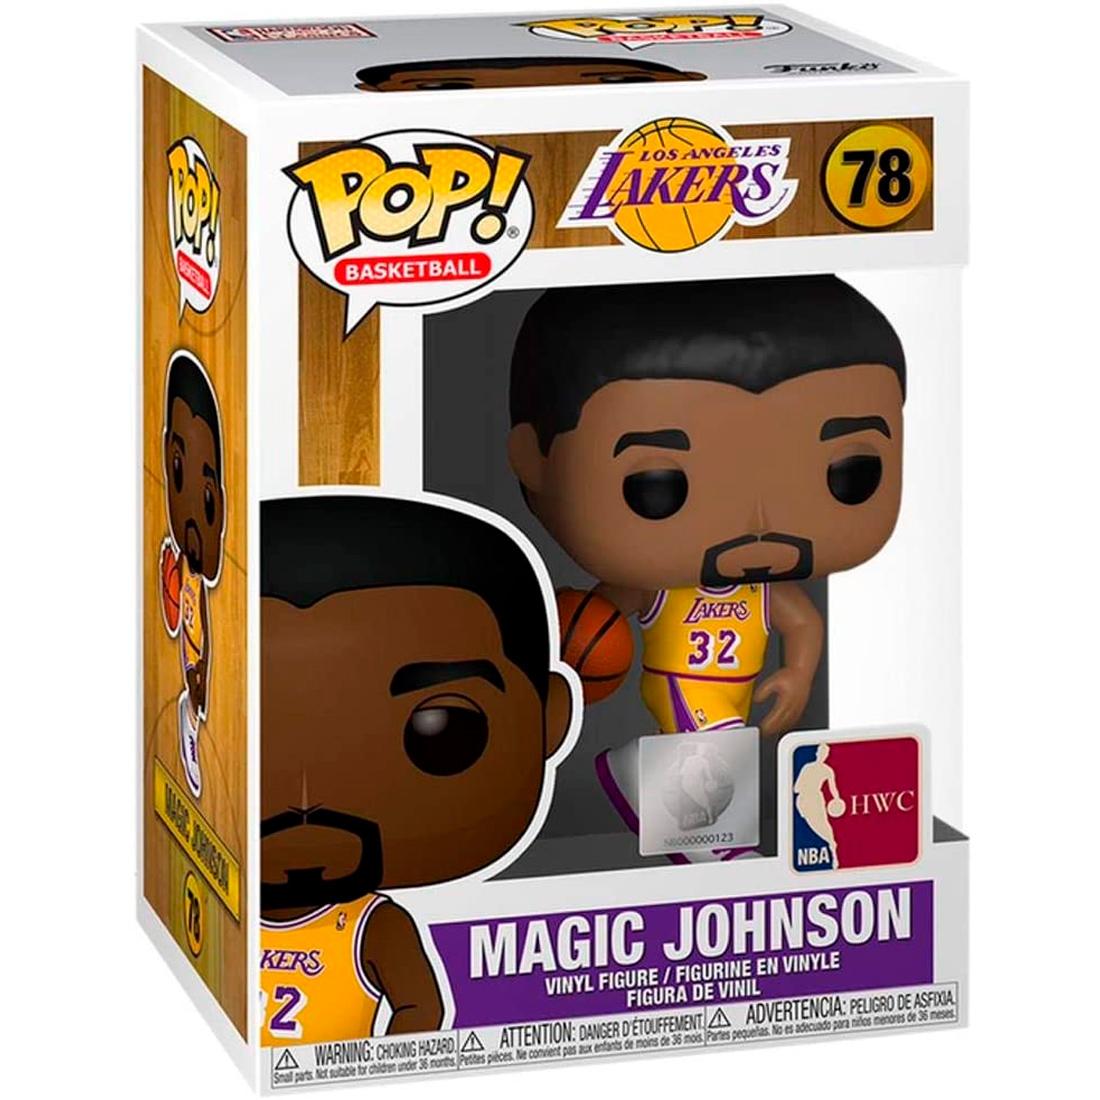 Funko Pop Basketball Los Angeles Lakers 78 Magic Johnson